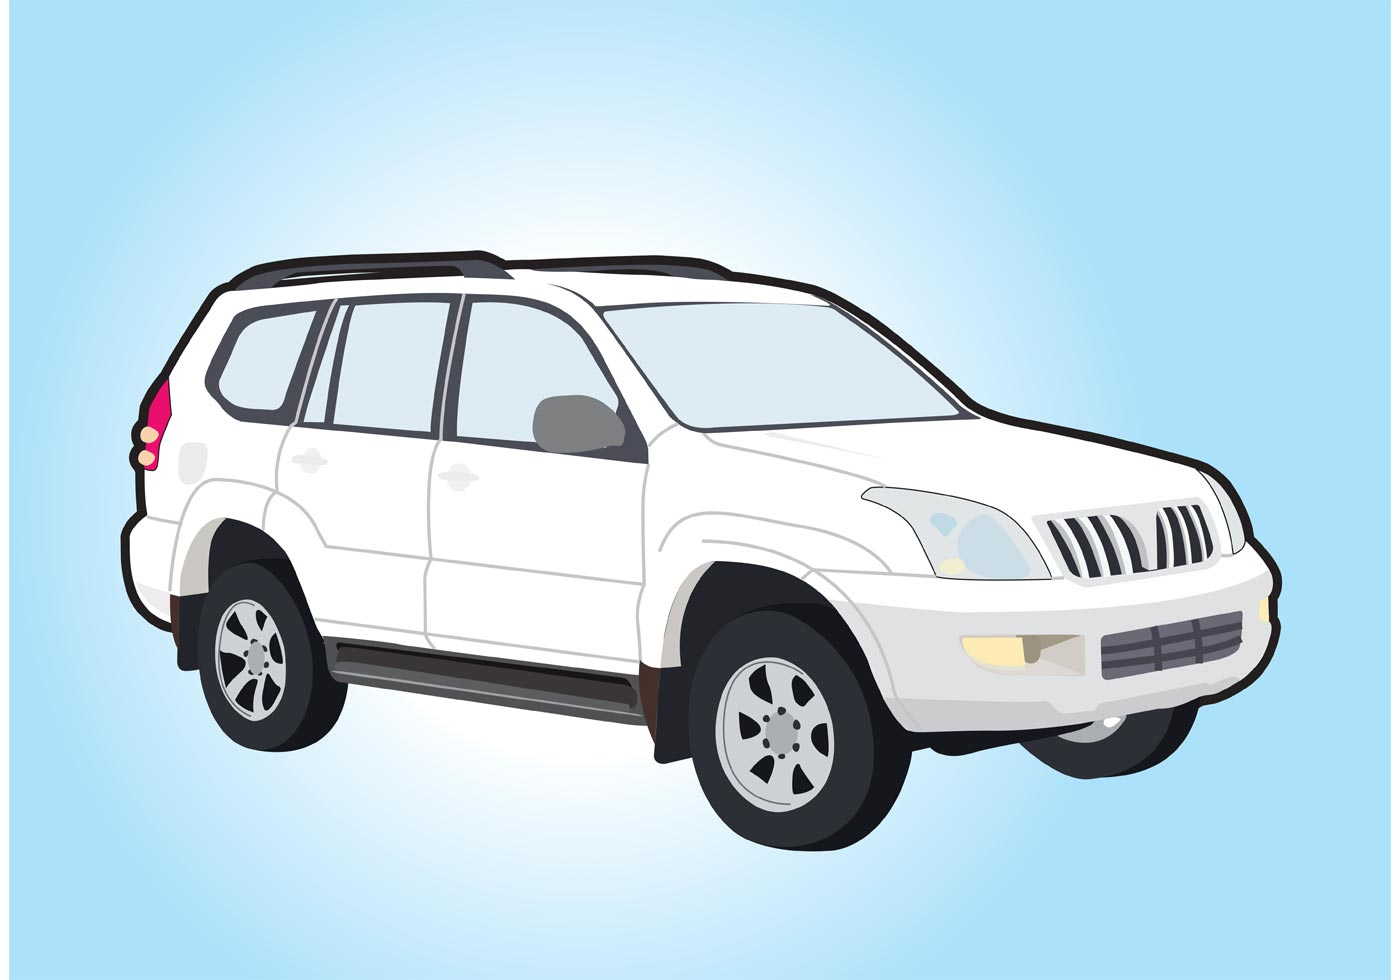 Toyota Land Cruiser Vector - Download Free Vector Art ...